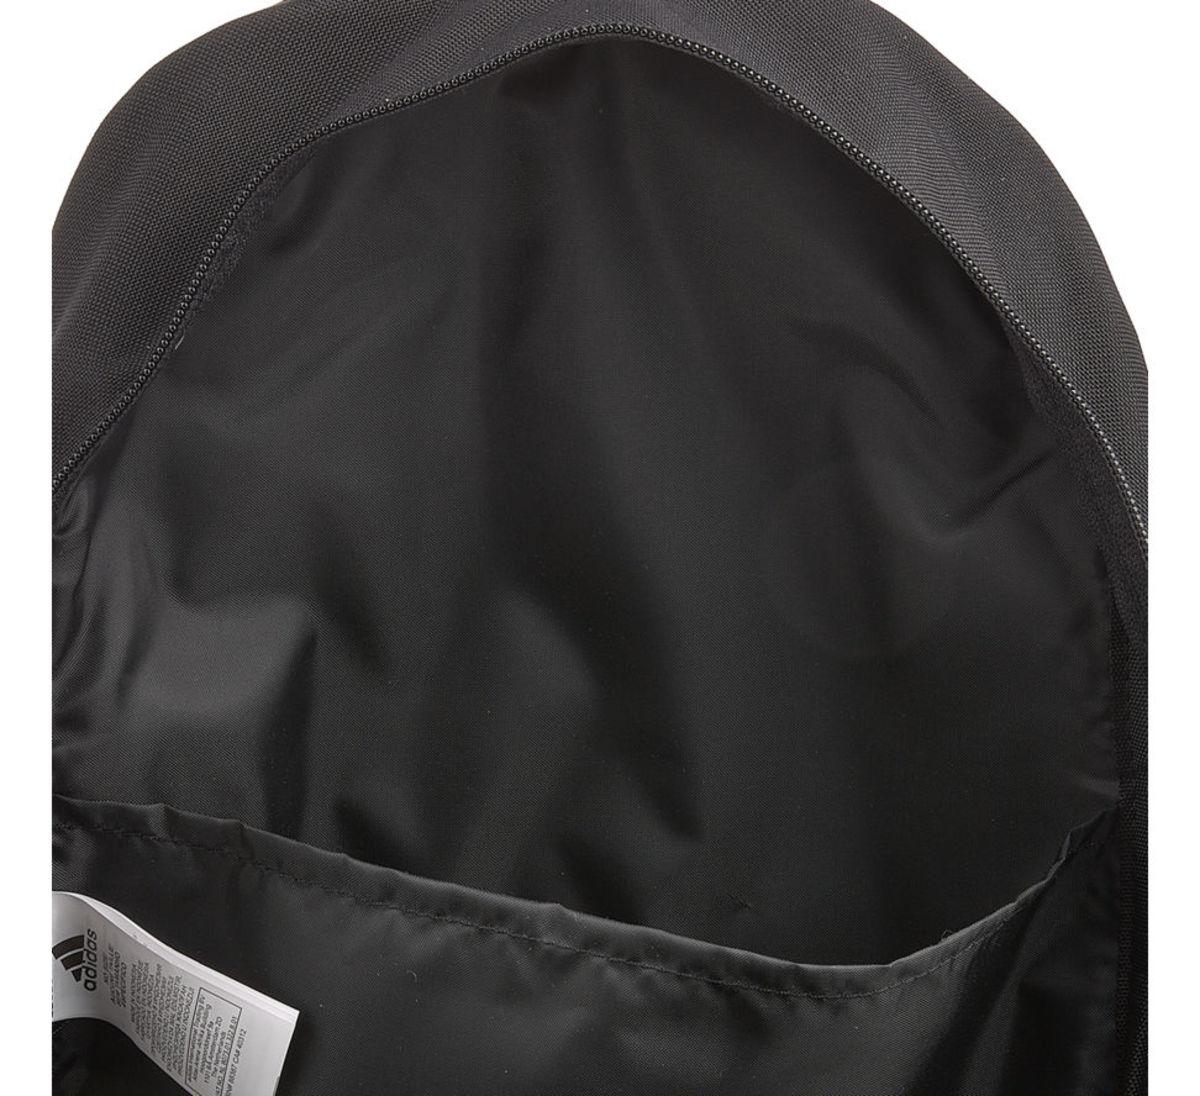 Bild 2 von adidas Rucksack - CLASSIC BP M